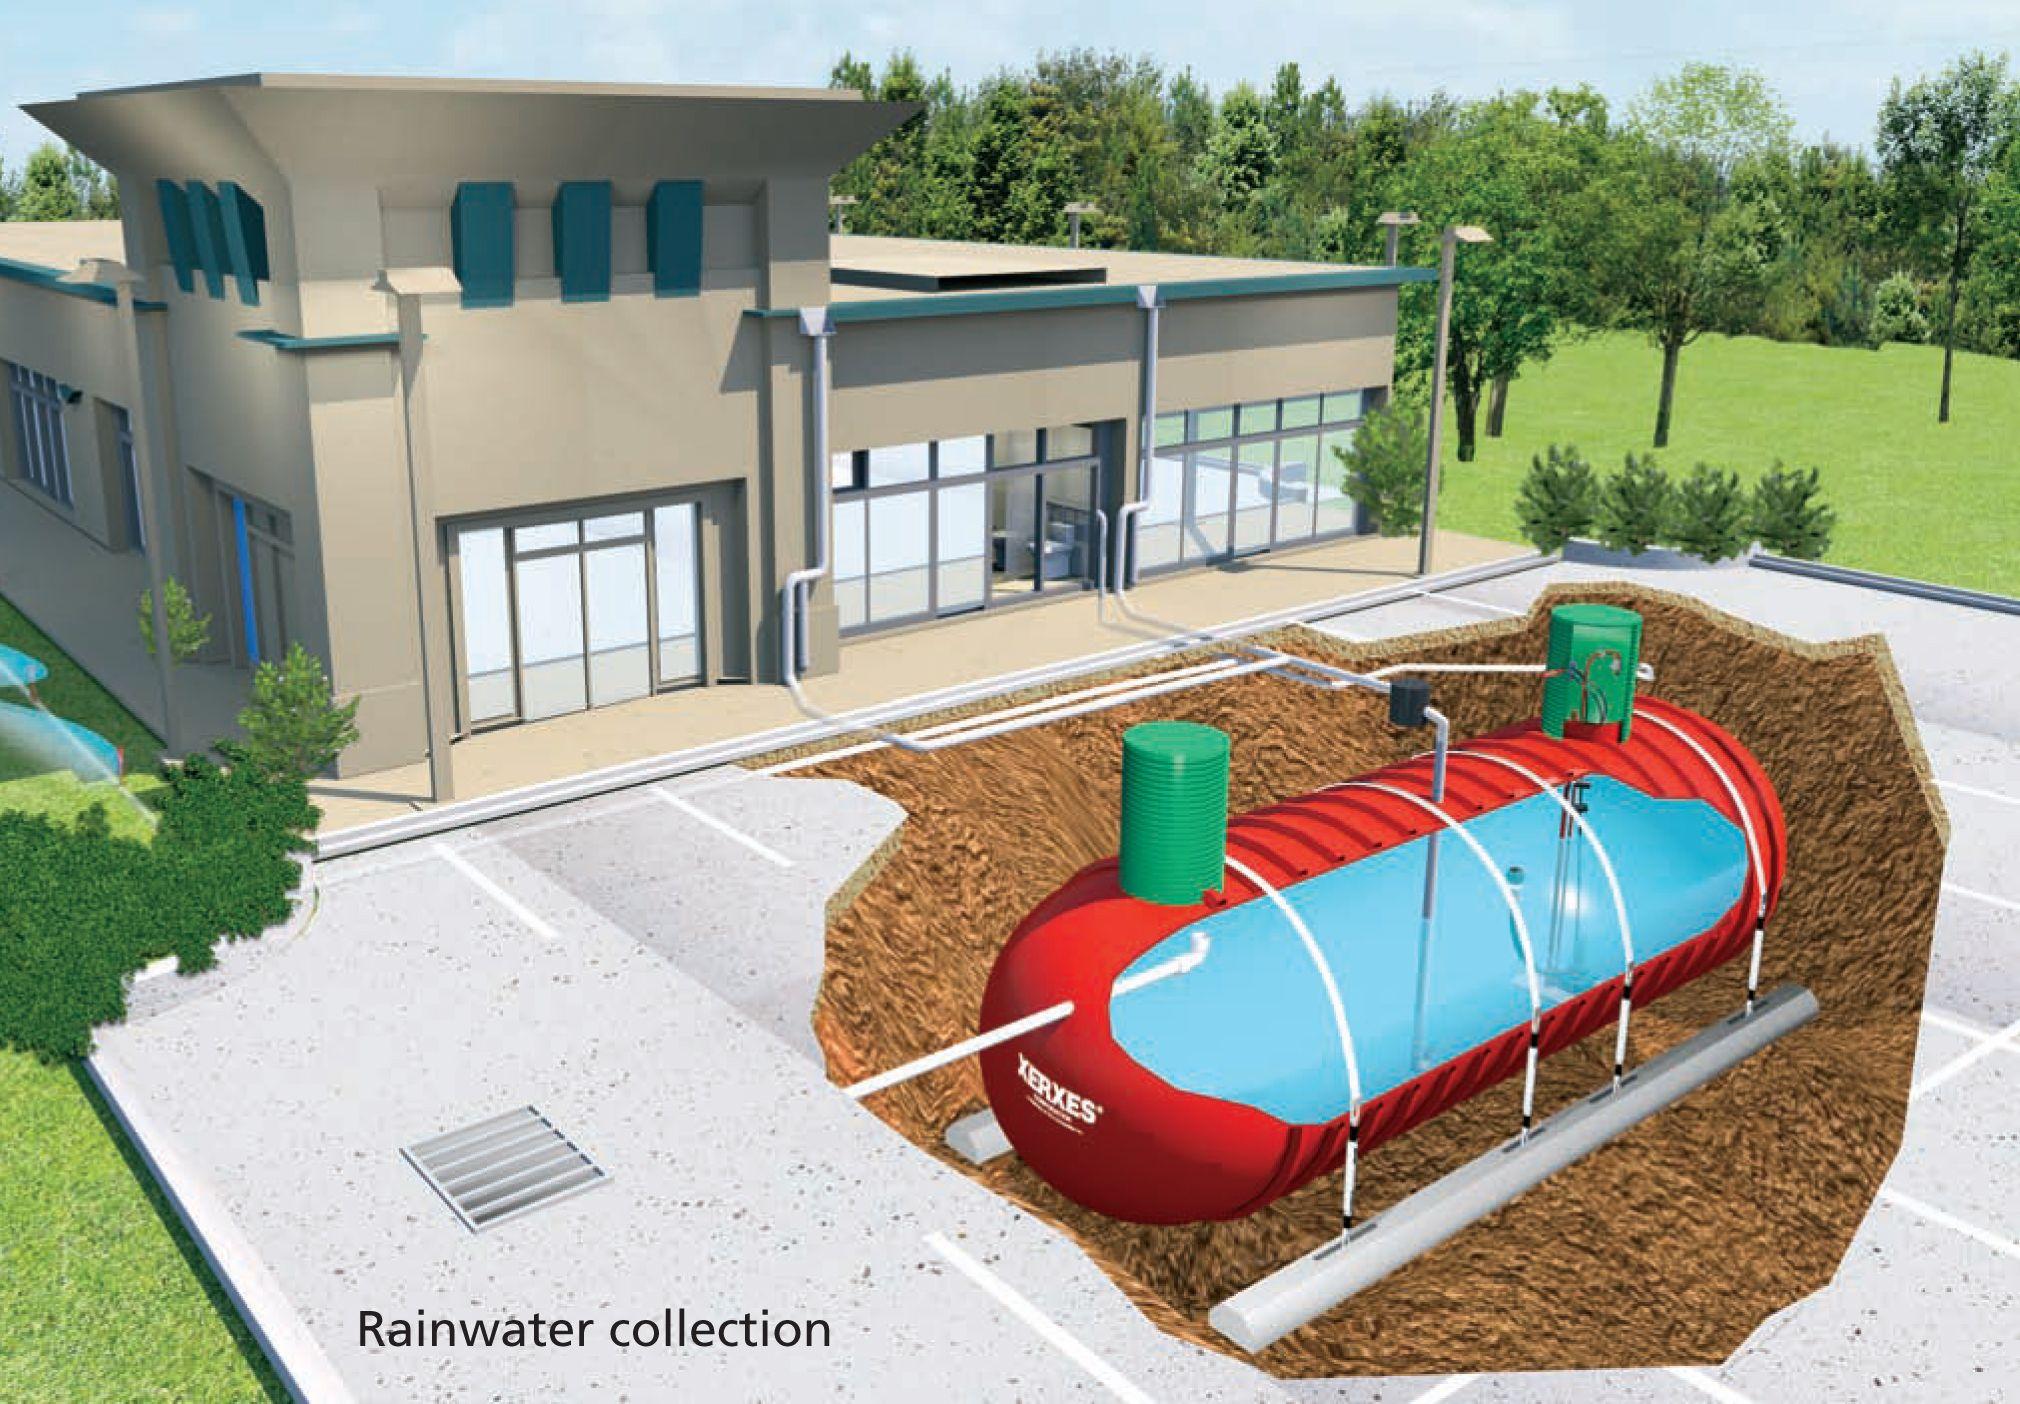 Designing A Stormwater Harvesting System Calculating Runoff And Tanks Rainwater Harvesting Green Roof Organic Yard